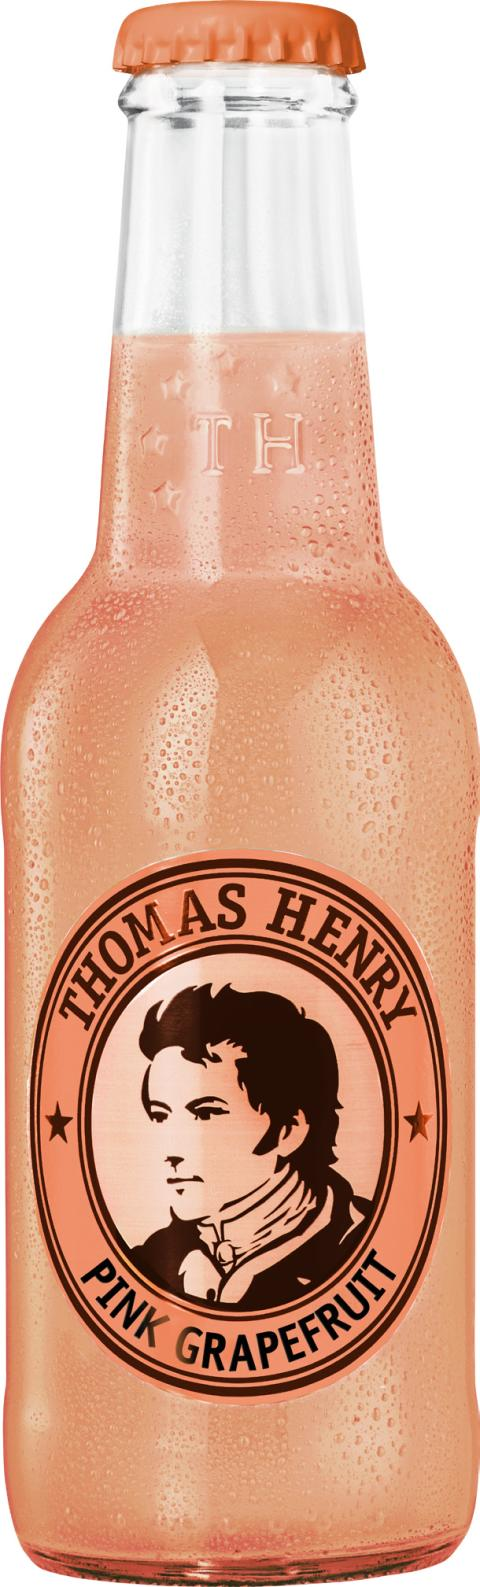 Thomas Henry Pink Grapefruit